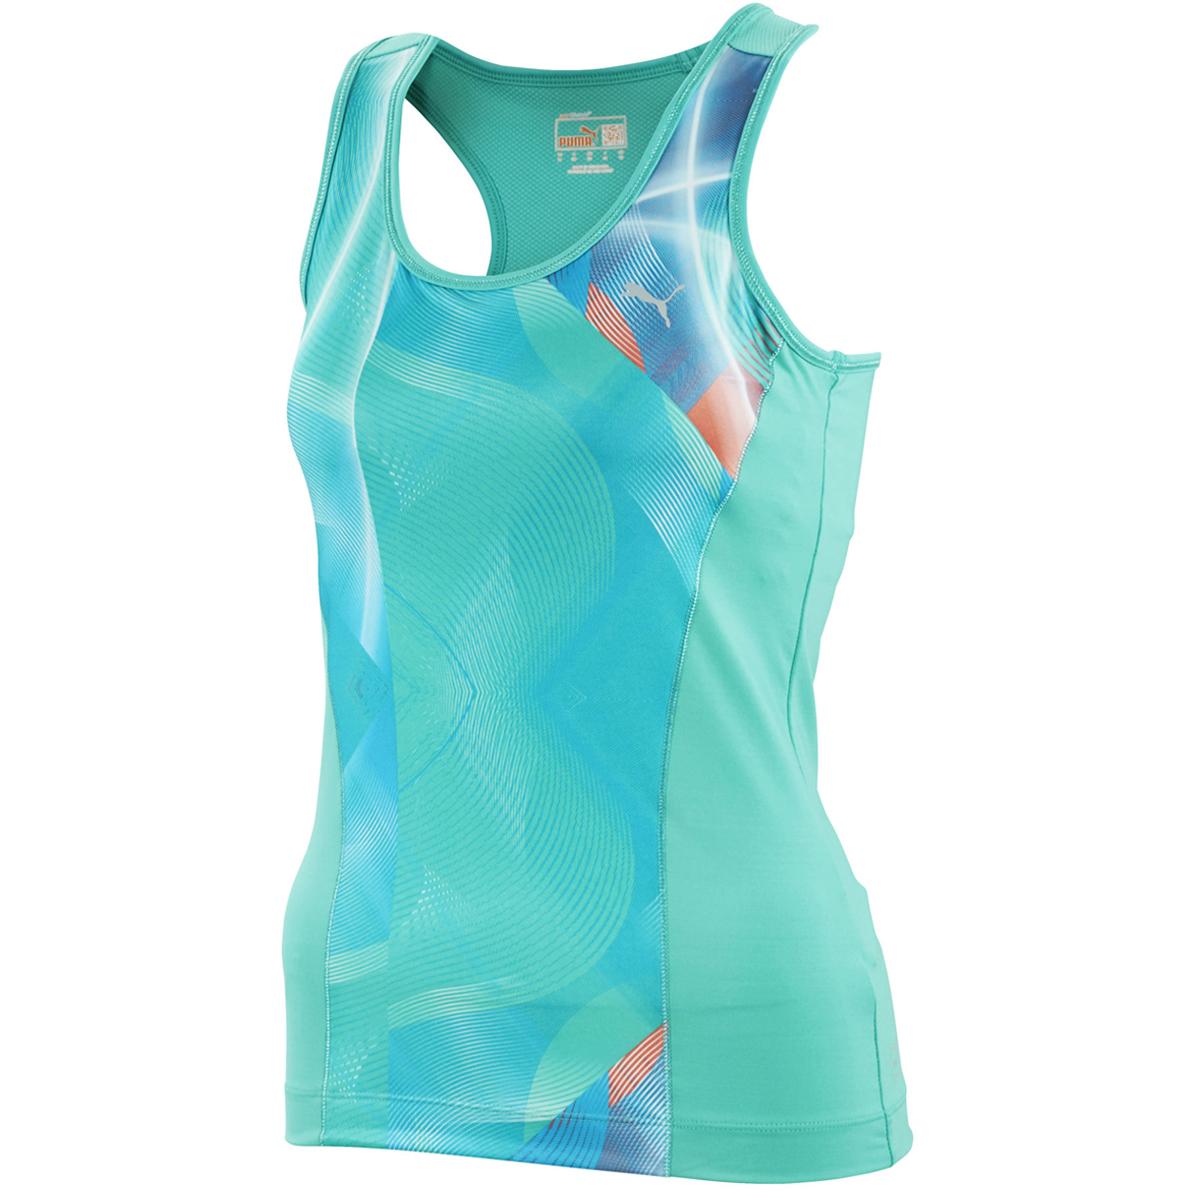 Puma Womens Graphic Gym Racerback Tank Top Vest T-Shirt Bra Support